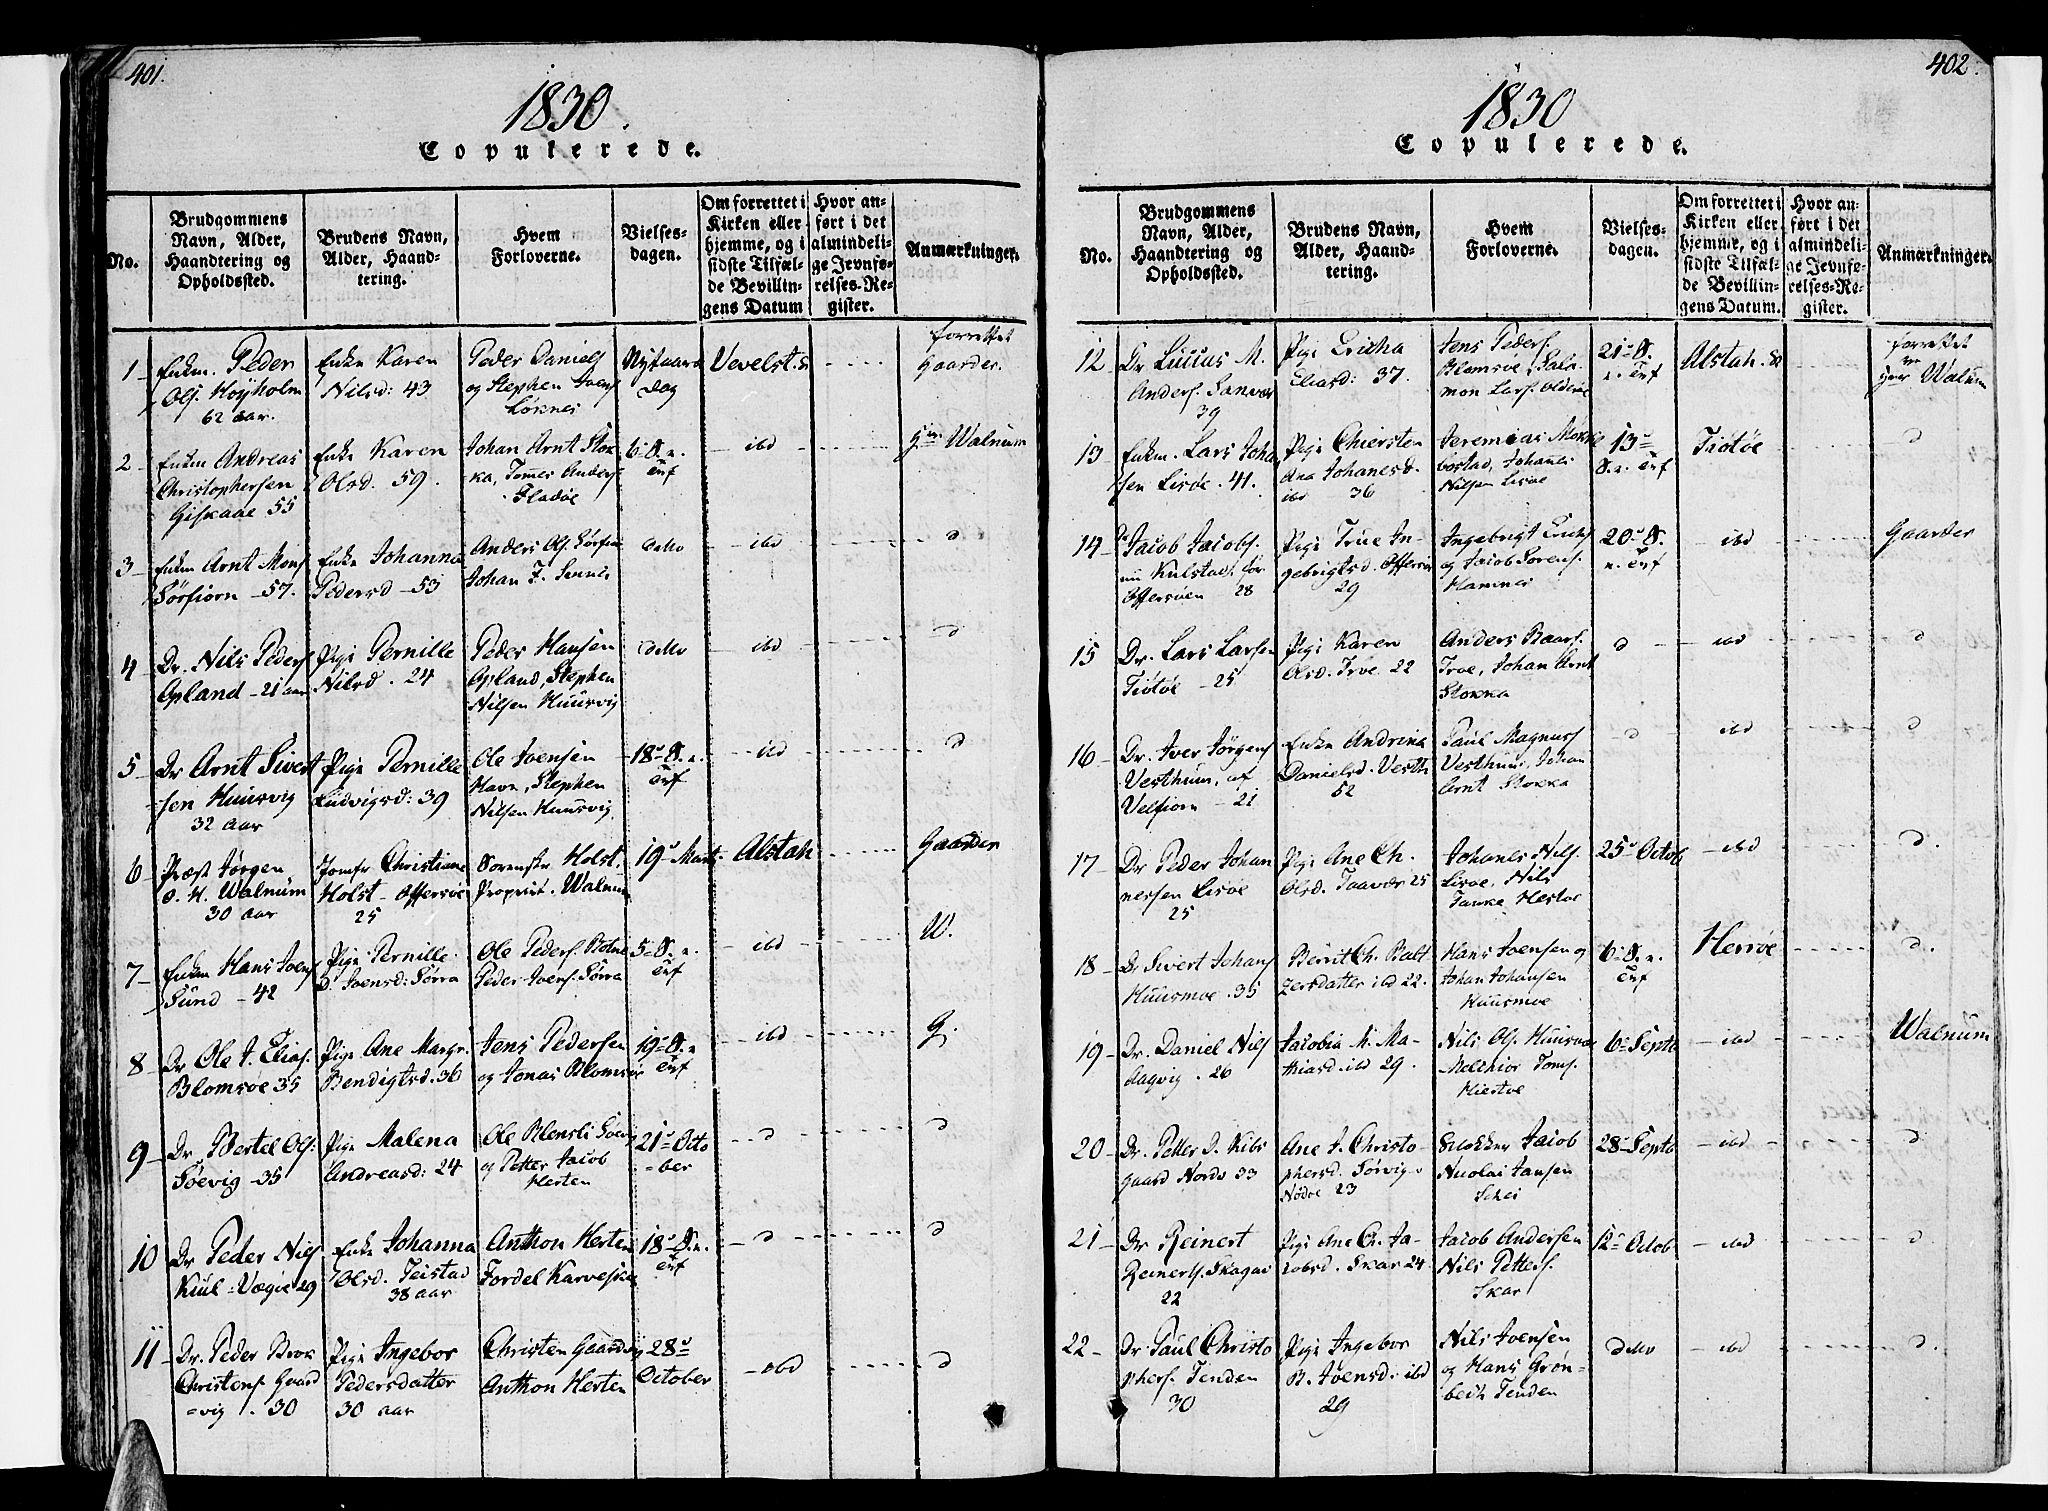 SAT, Ministerialprotokoller, klokkerbøker og fødselsregistre - Nordland, 830/L0445: Ministerialbok nr. 830A09, 1820-1830, s. 401-402